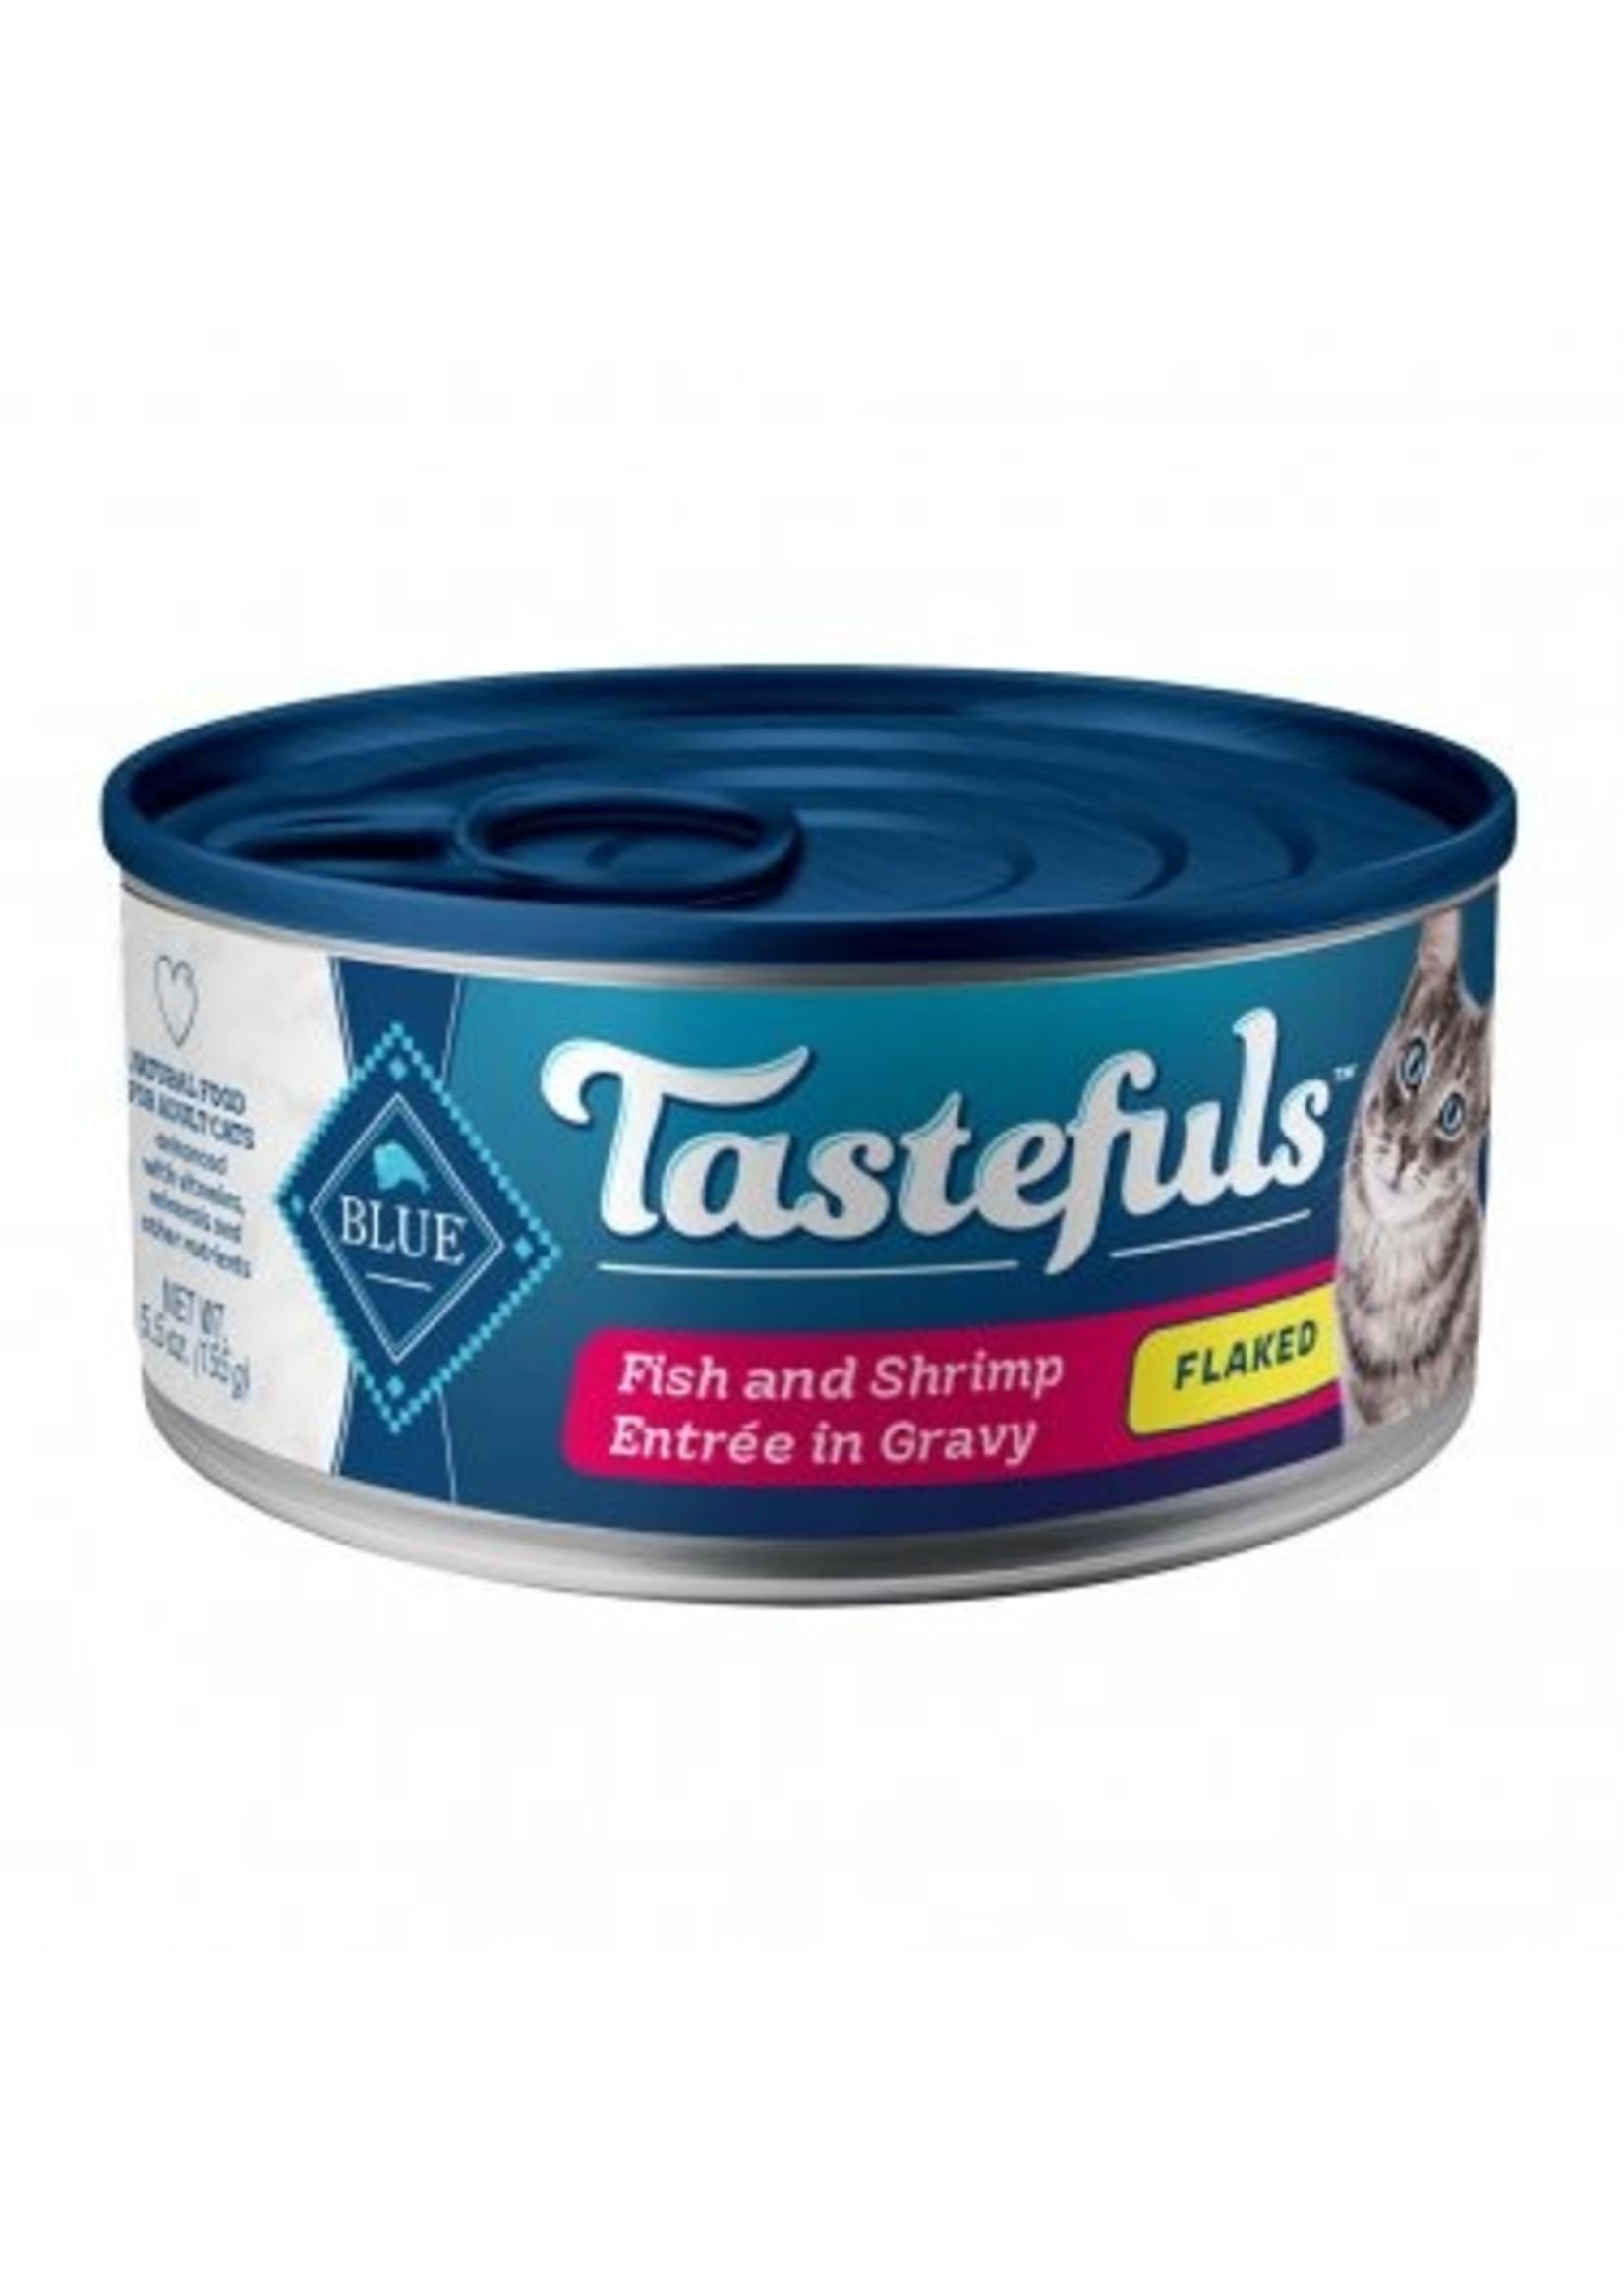 Blue Buffalo Blue Buffalo Tastefuls Fish & Shrimp Cat Food 5.5 Oz